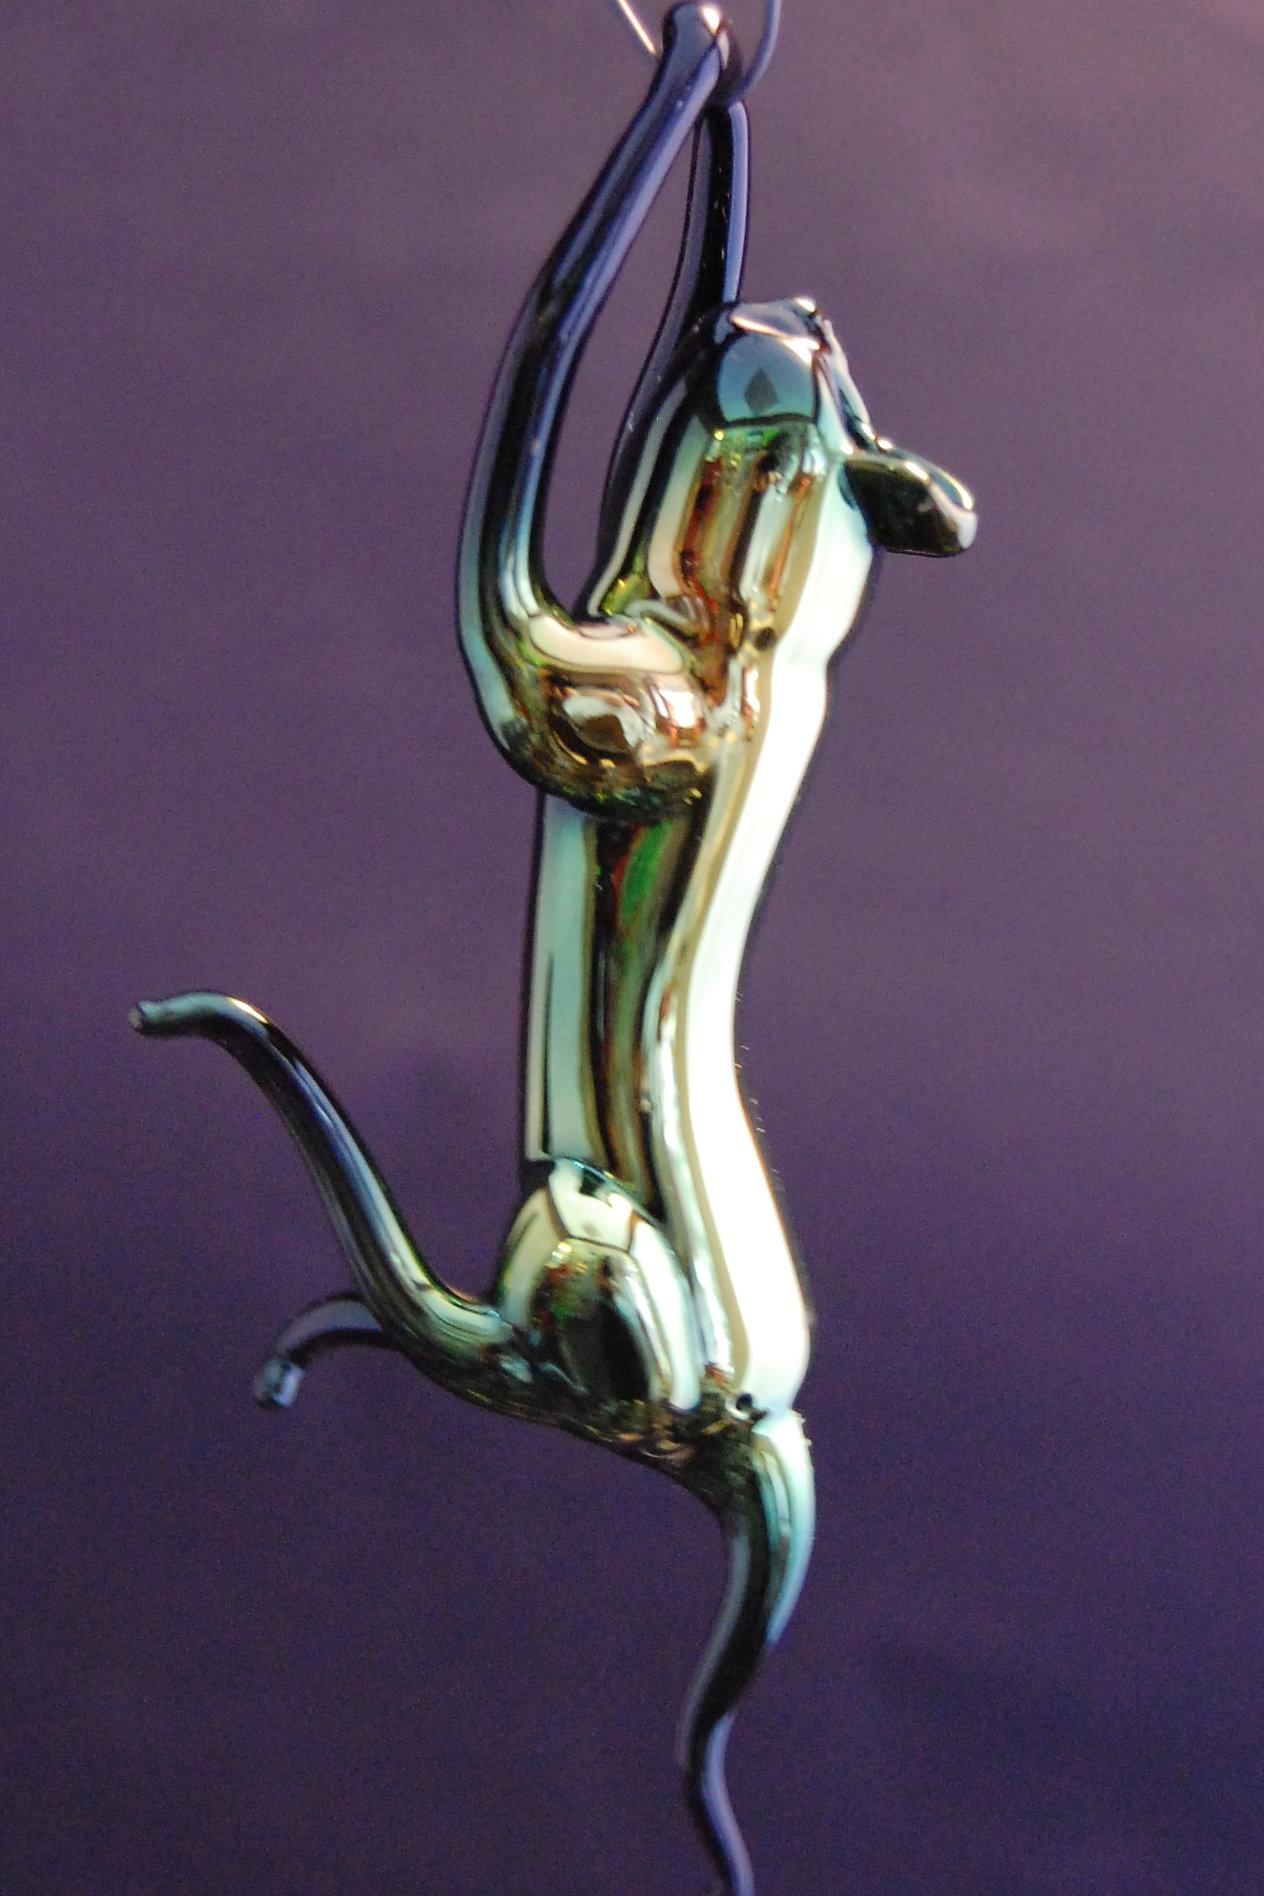 Glass cat ornaments - Working Glass Hanging Cat Ornaments